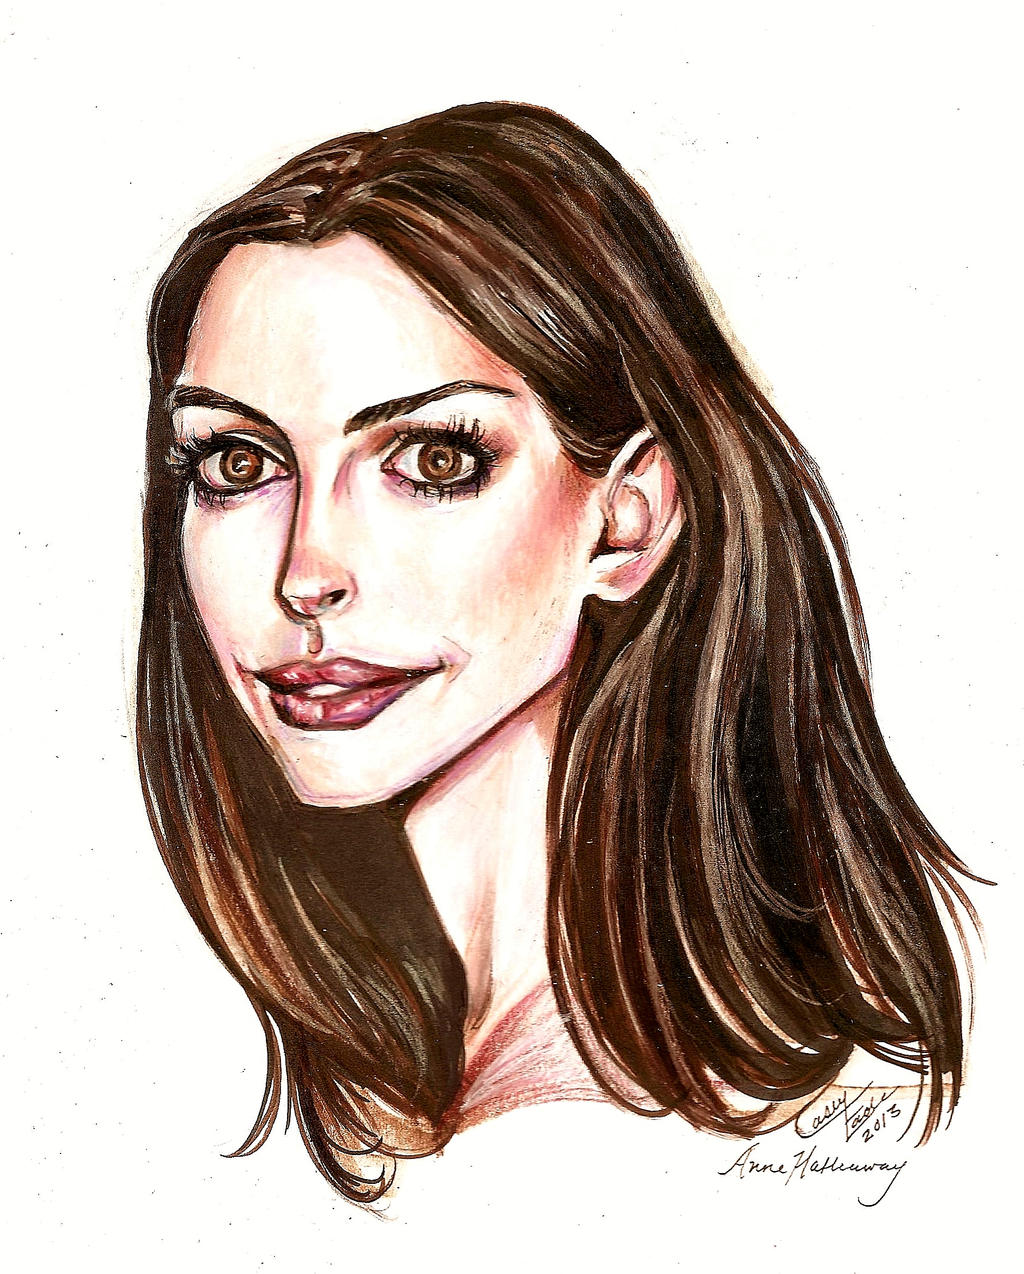 Anne Hathaway Drawing: Anne Hathaway By Muirin007 On DeviantART